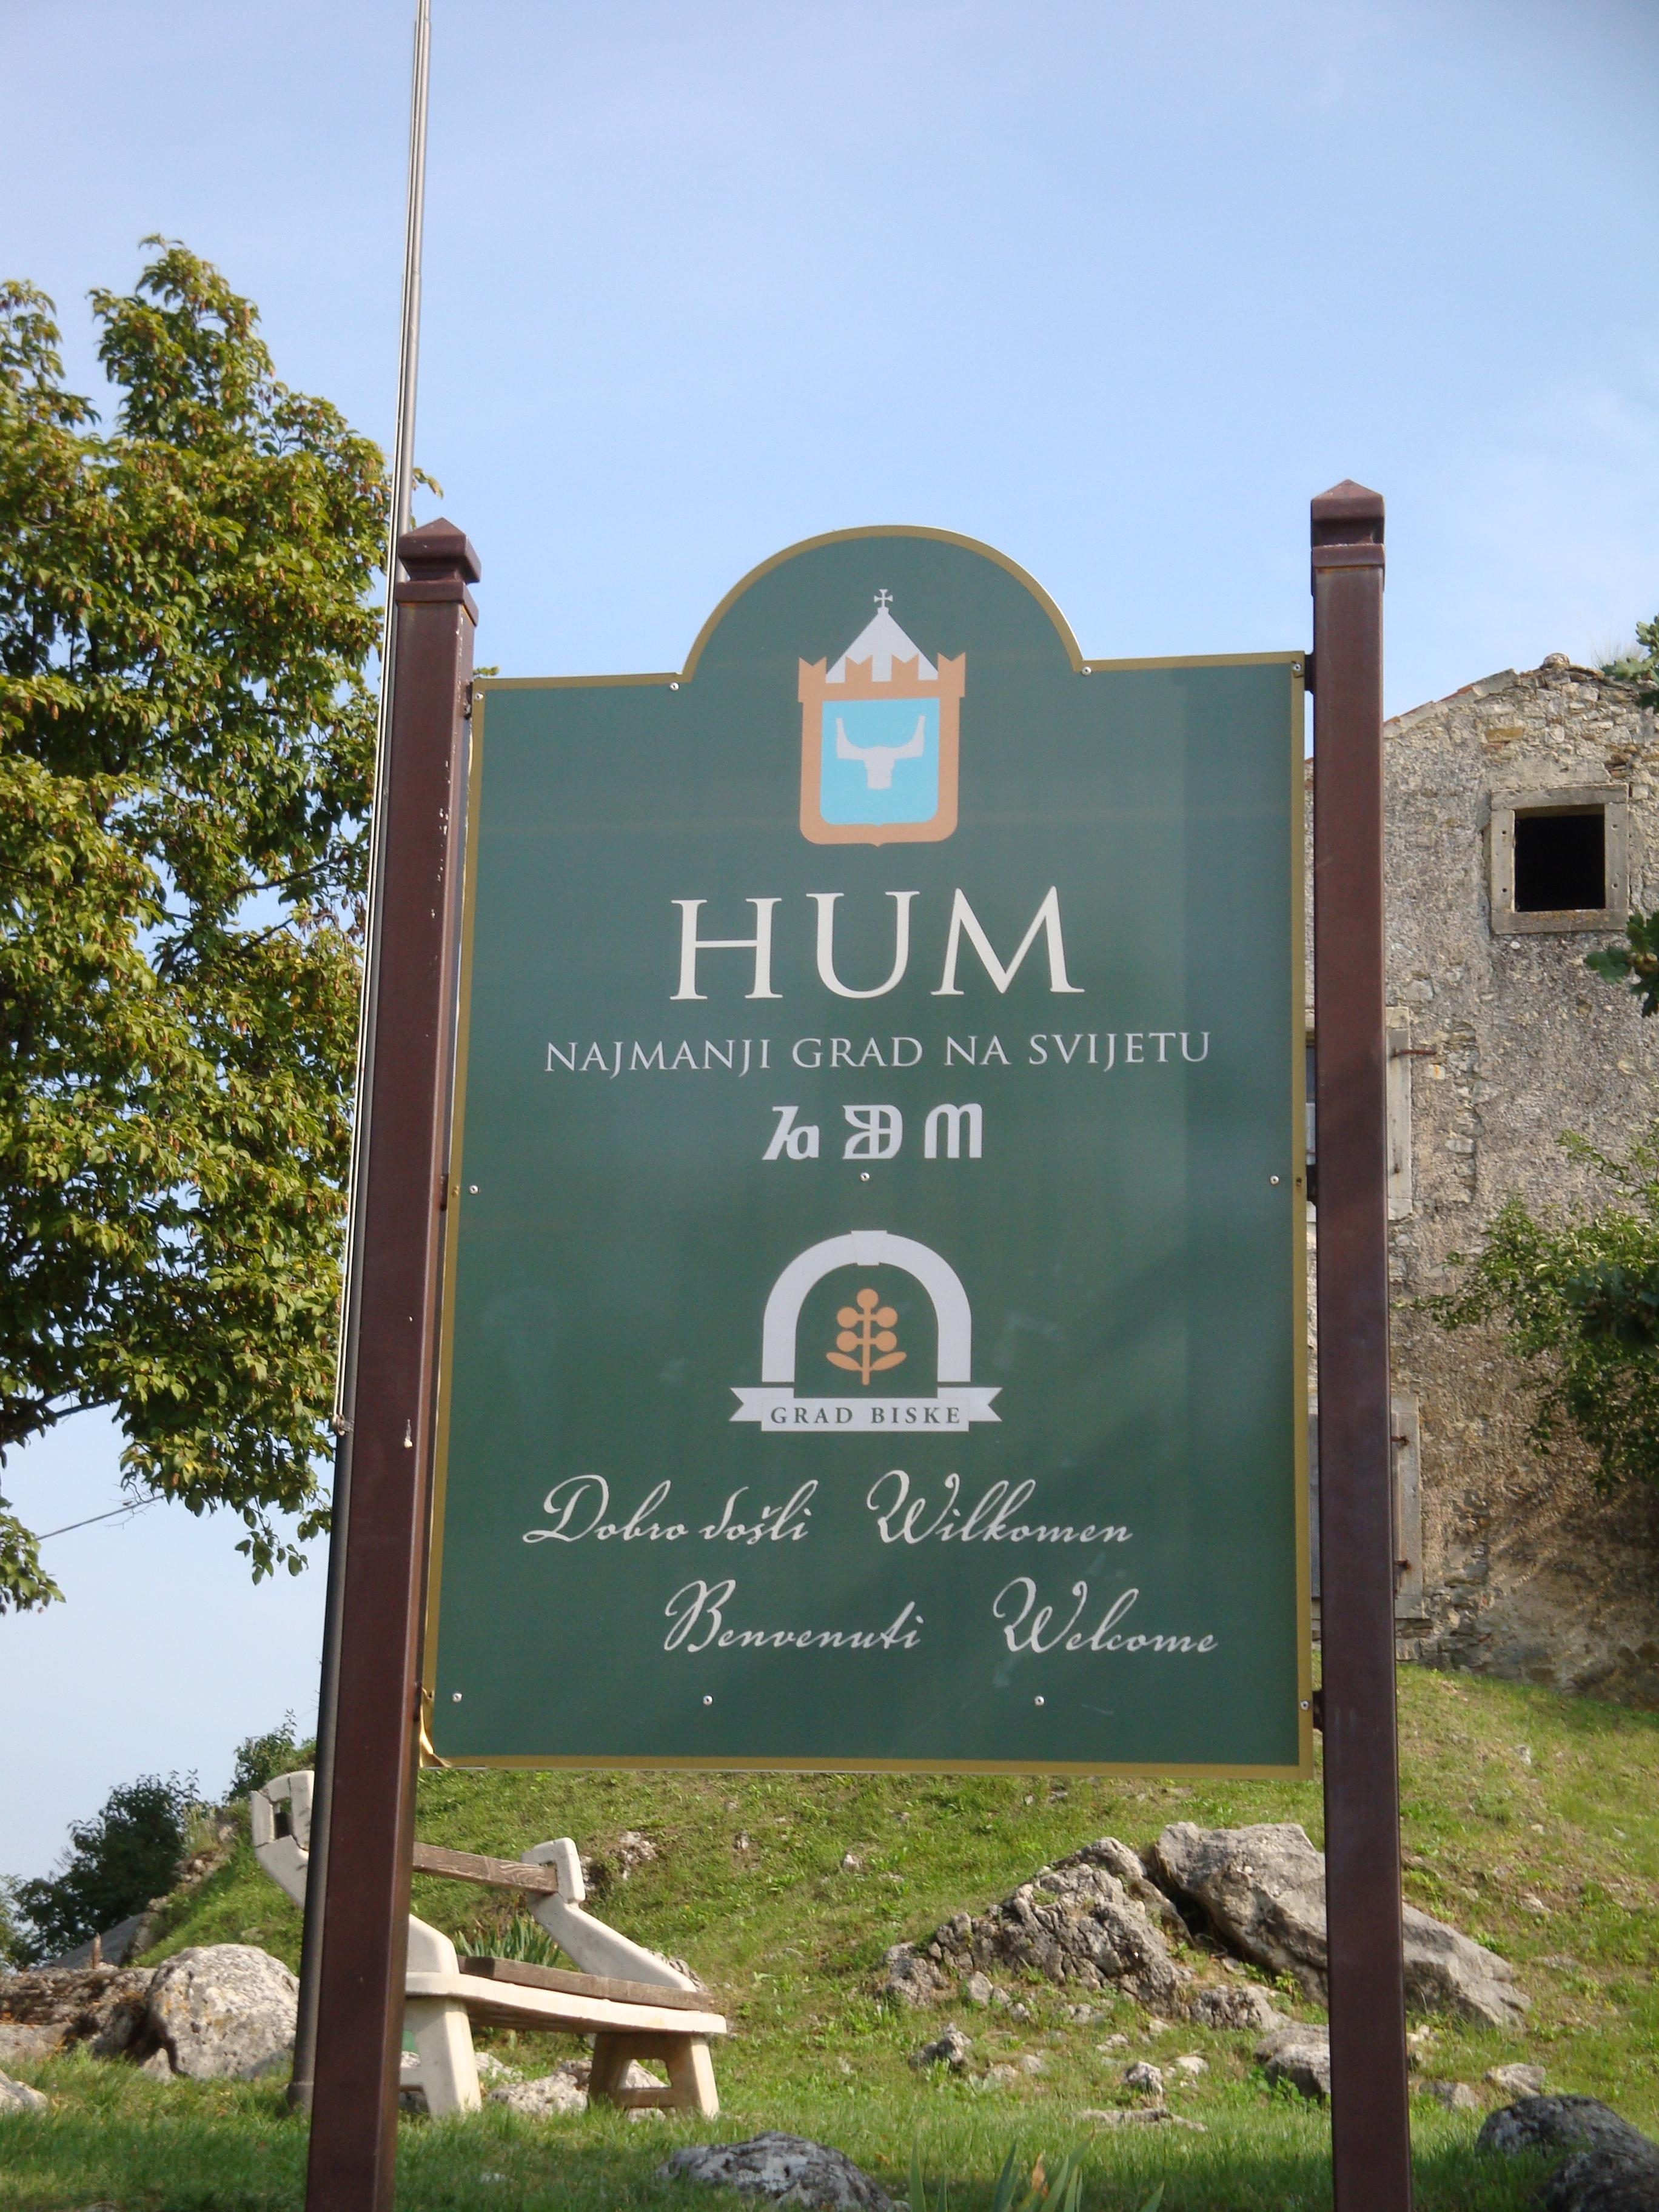 Hum - najmenšie mesto na svet